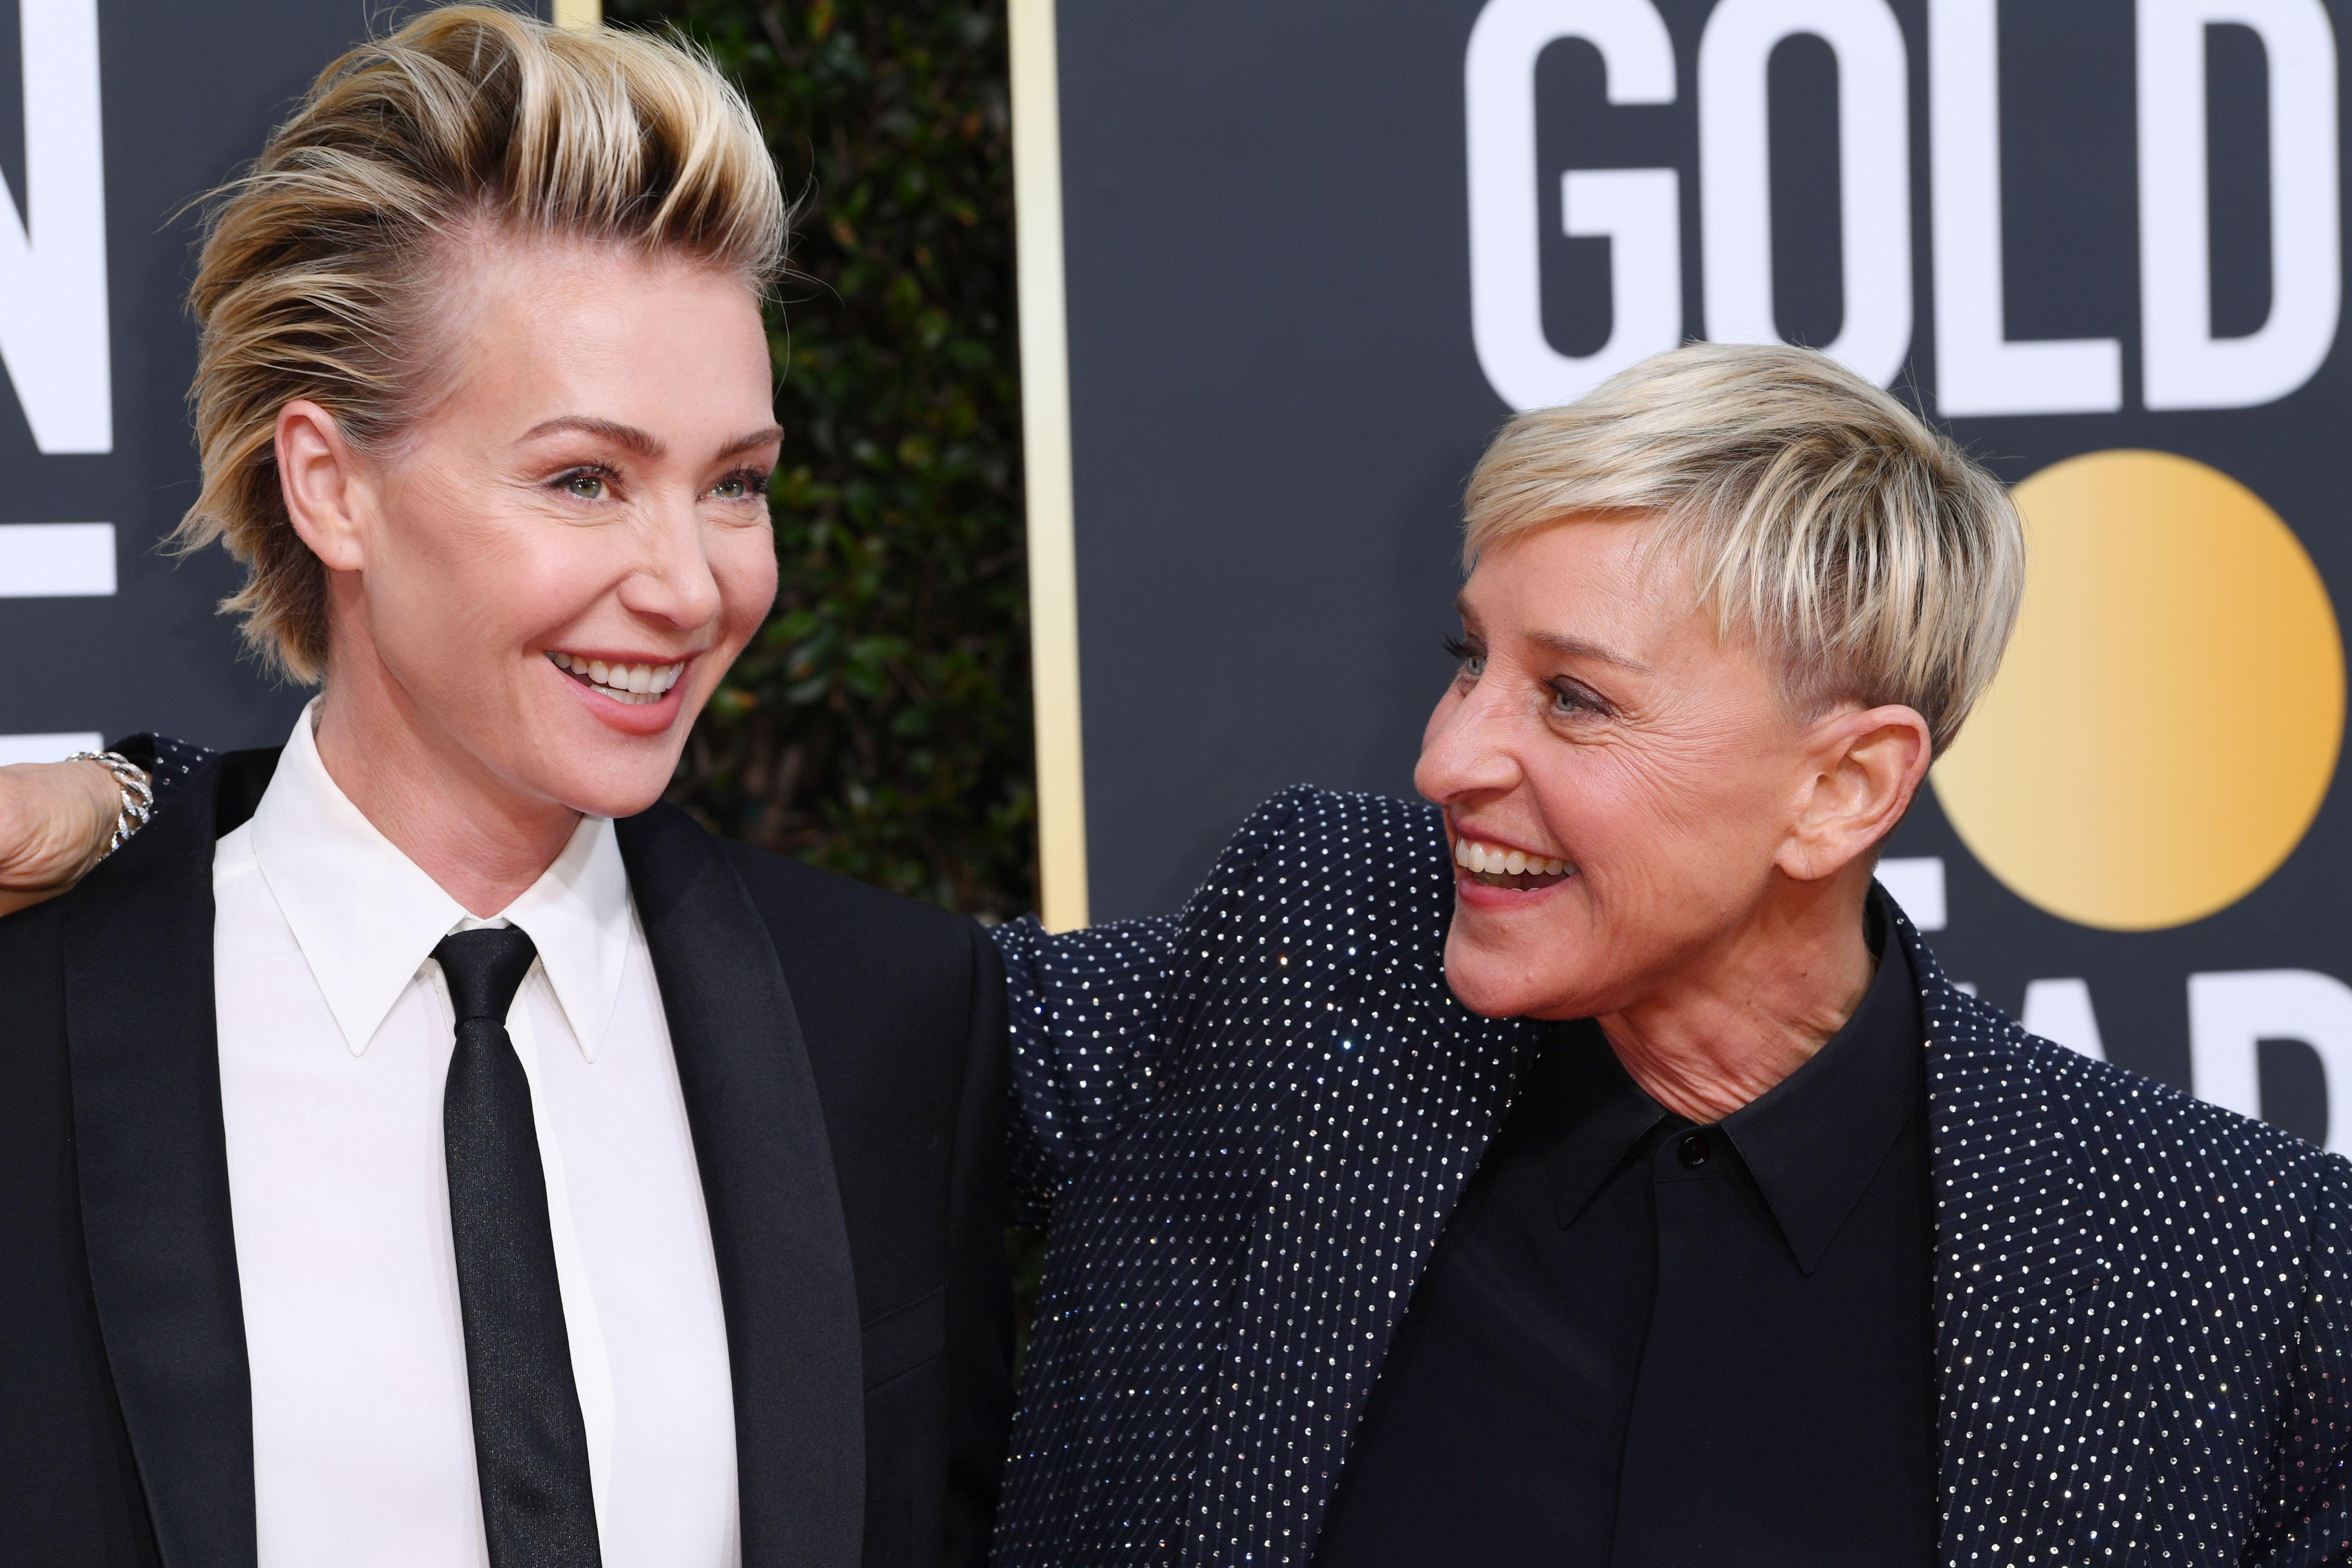 Portia de Rossi Surprises Wife Ellen DeGeneres With Poker Lessons for Her 62nd Birthday